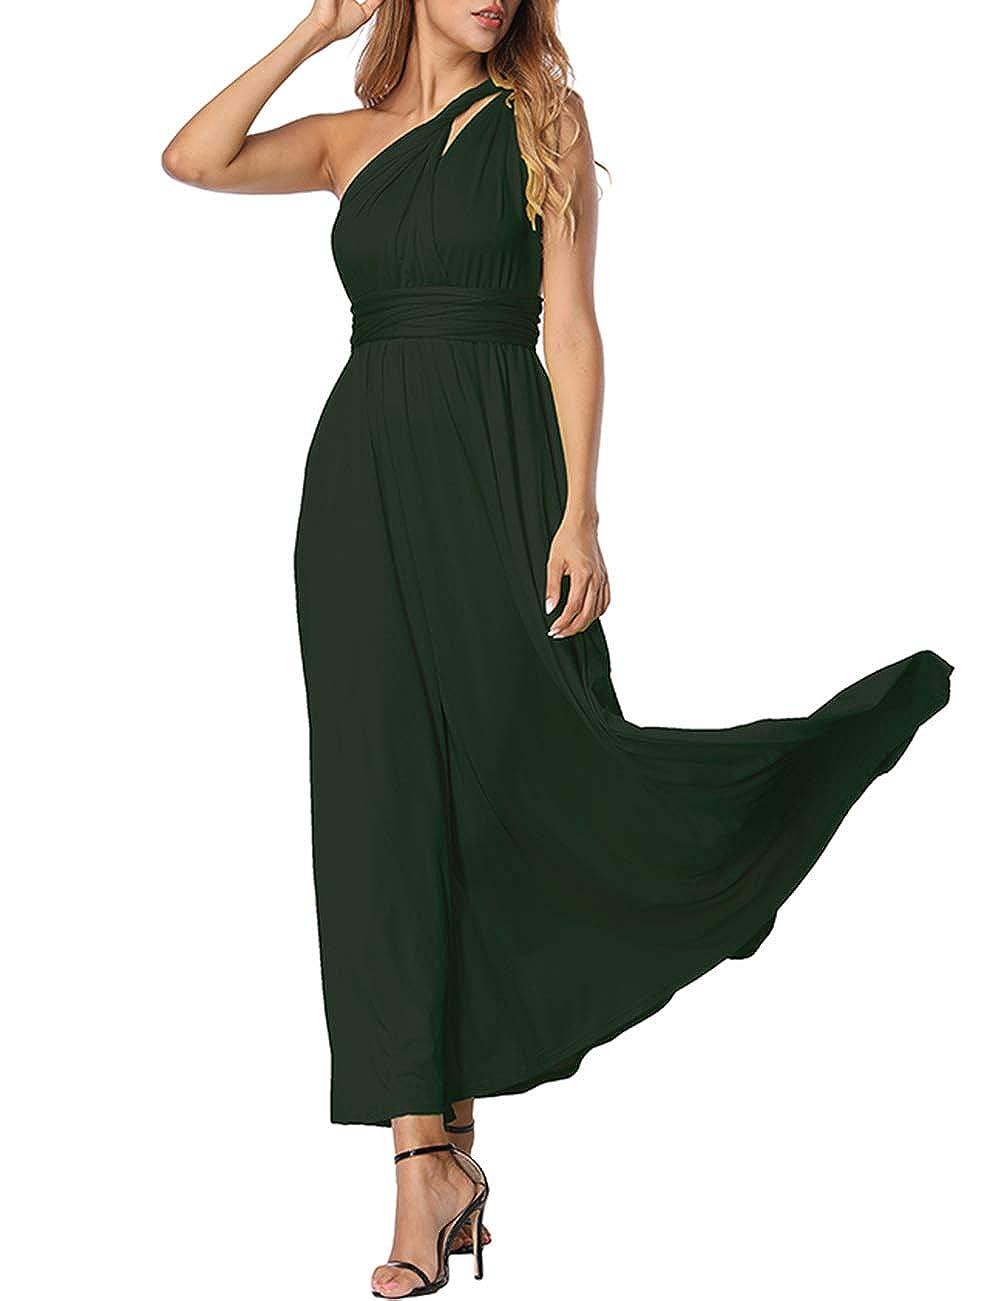 TALLA L(ES 44-46). FeelinGirl Mujer Vestido de Noche Longitud Máxima Falda Fiesta Cóctel Tirantes Convertibles Multi-Manera Verdinegro L(ES 44-46)